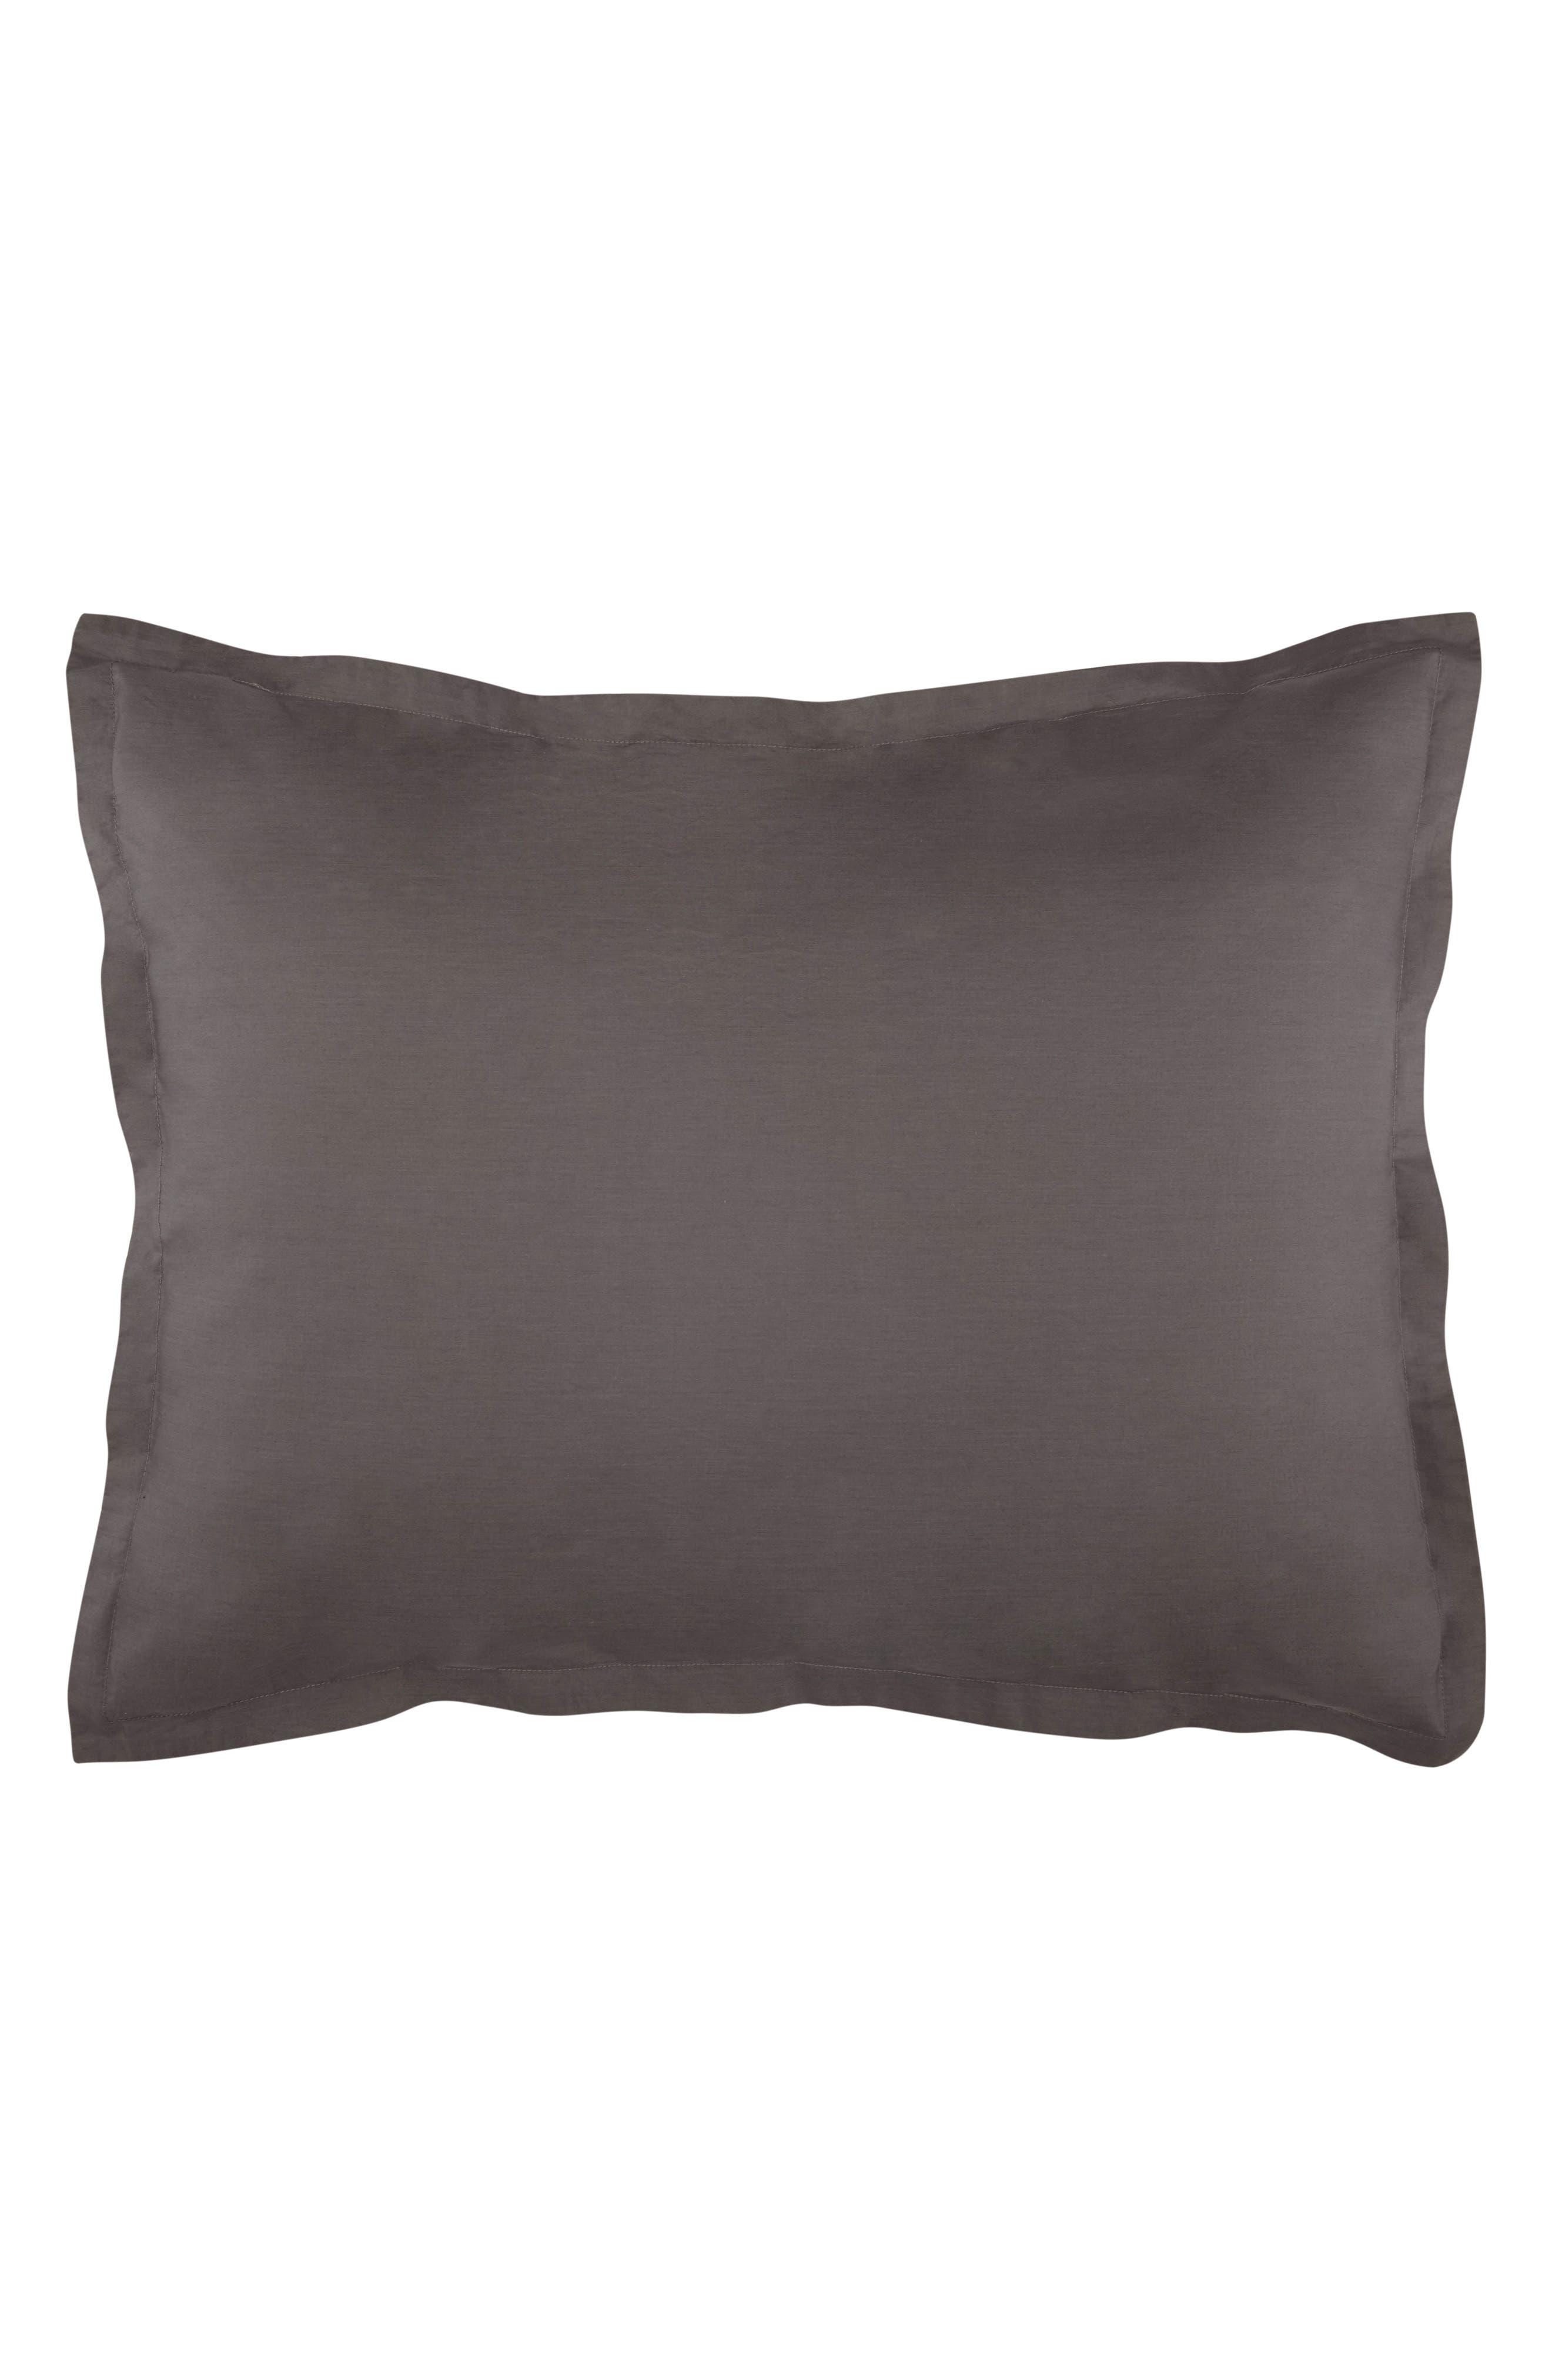 Lorimer 300 Thread Count Pillow Sham,                             Main thumbnail 1, color,                             020